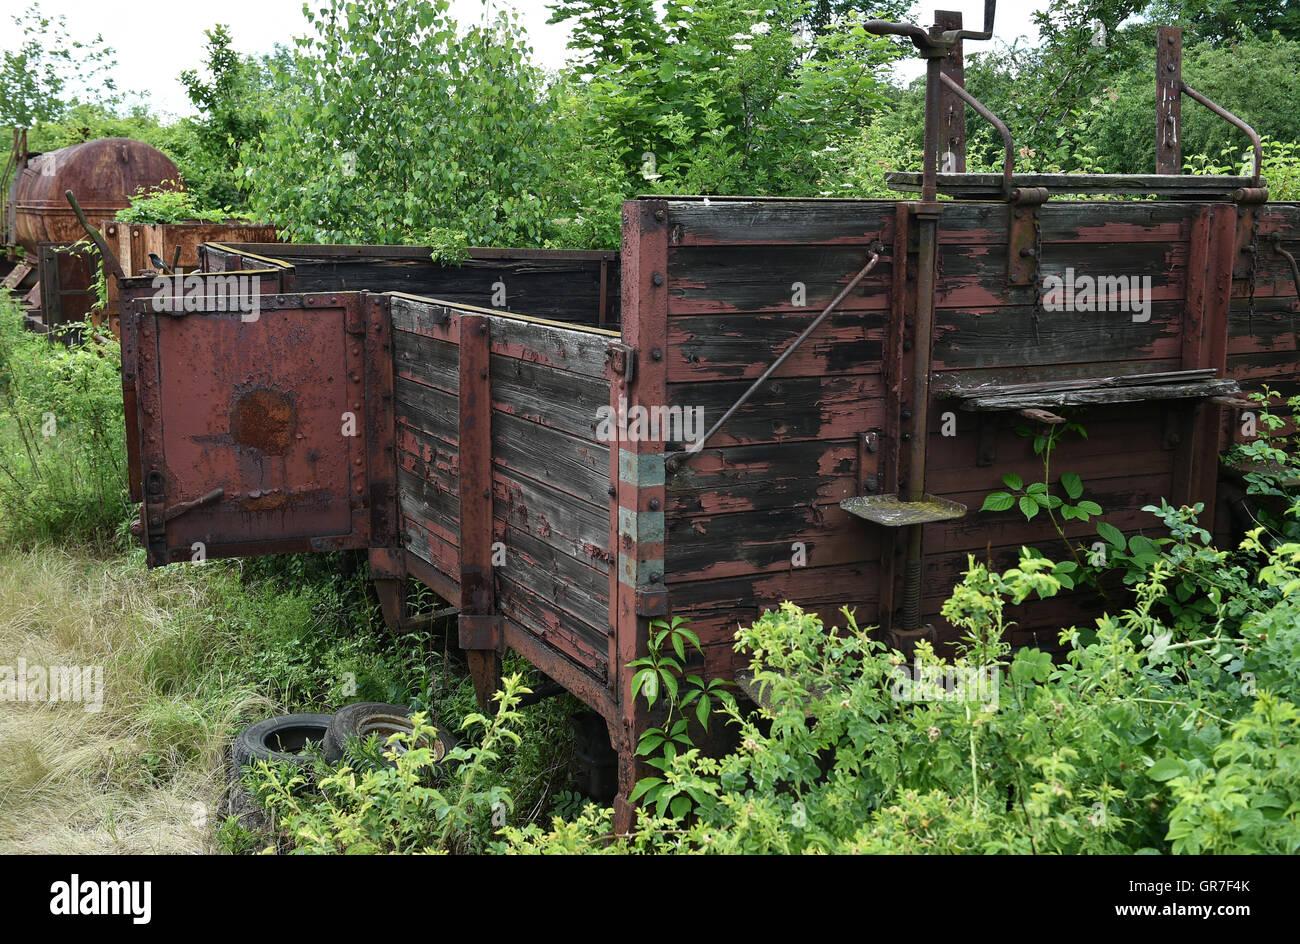 Age Railroad Car - Stock Image